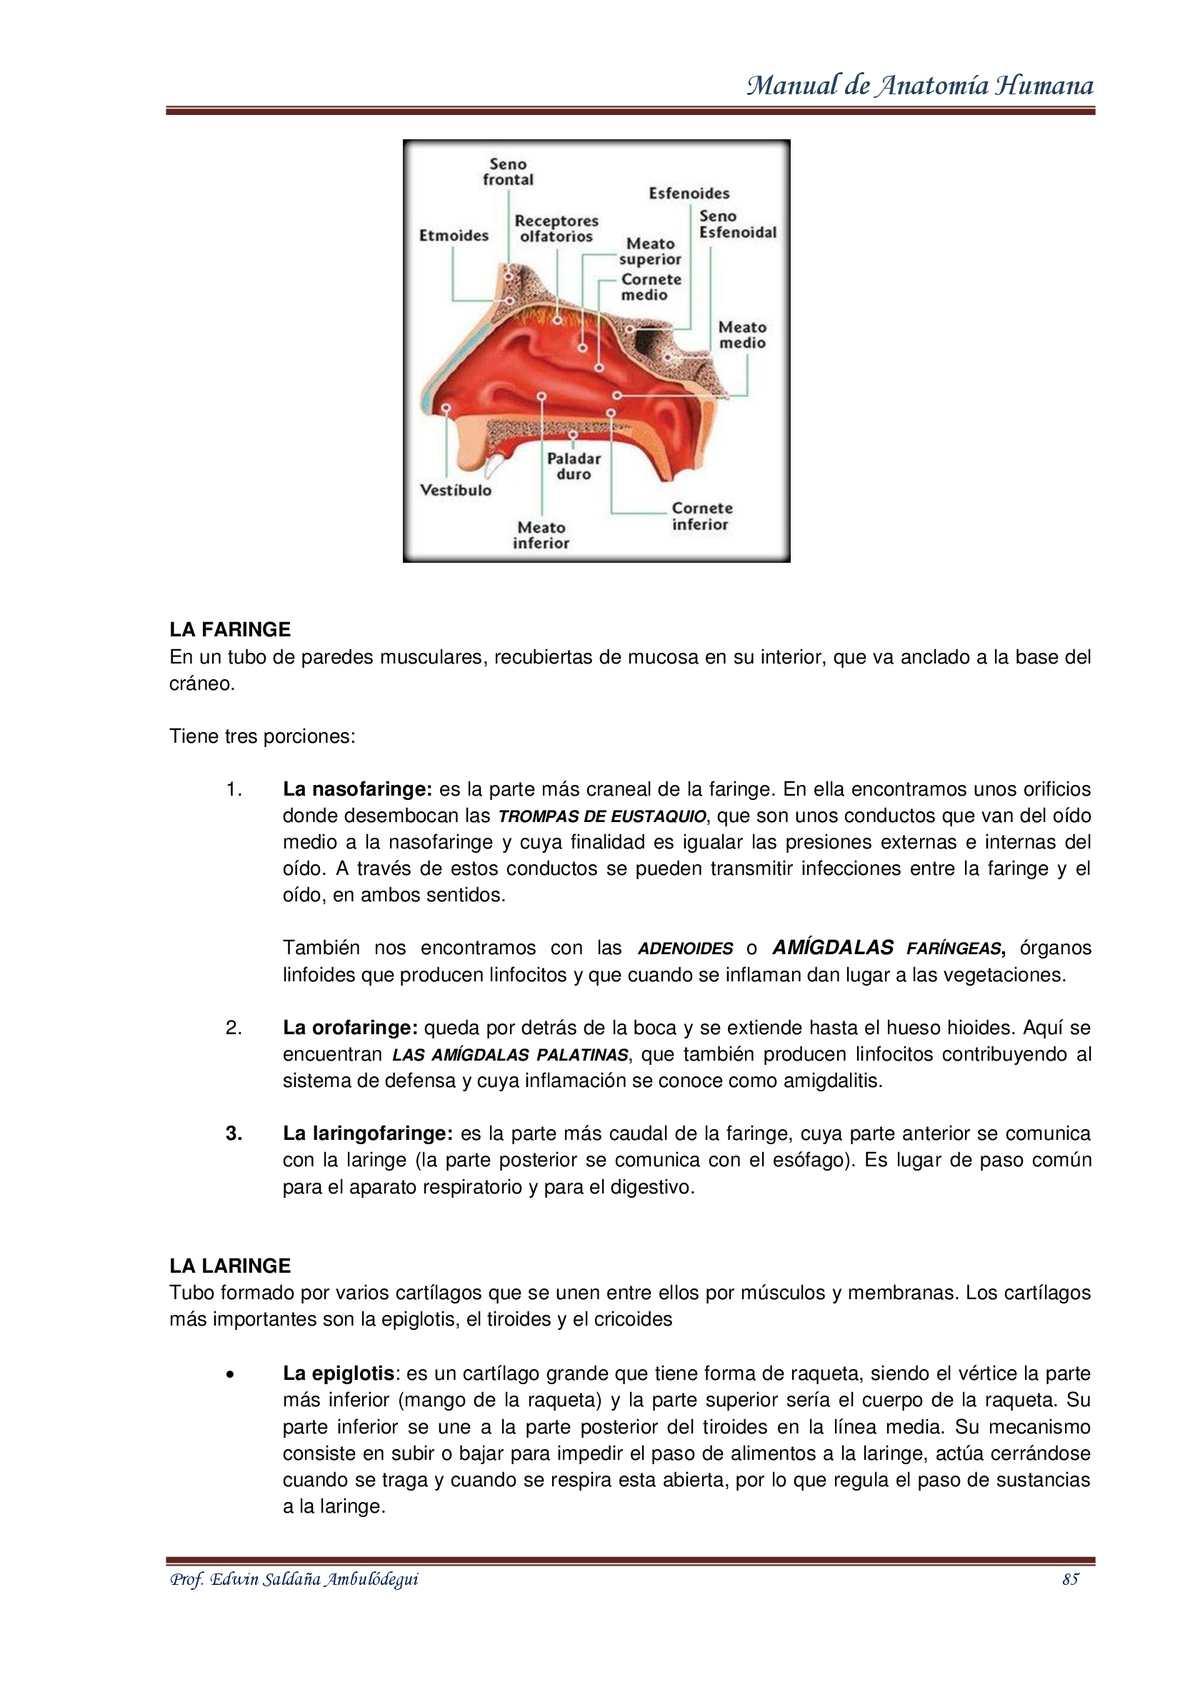 Manual de anatomia humana Edwin Ambulódegui - CALAMEO Downloader